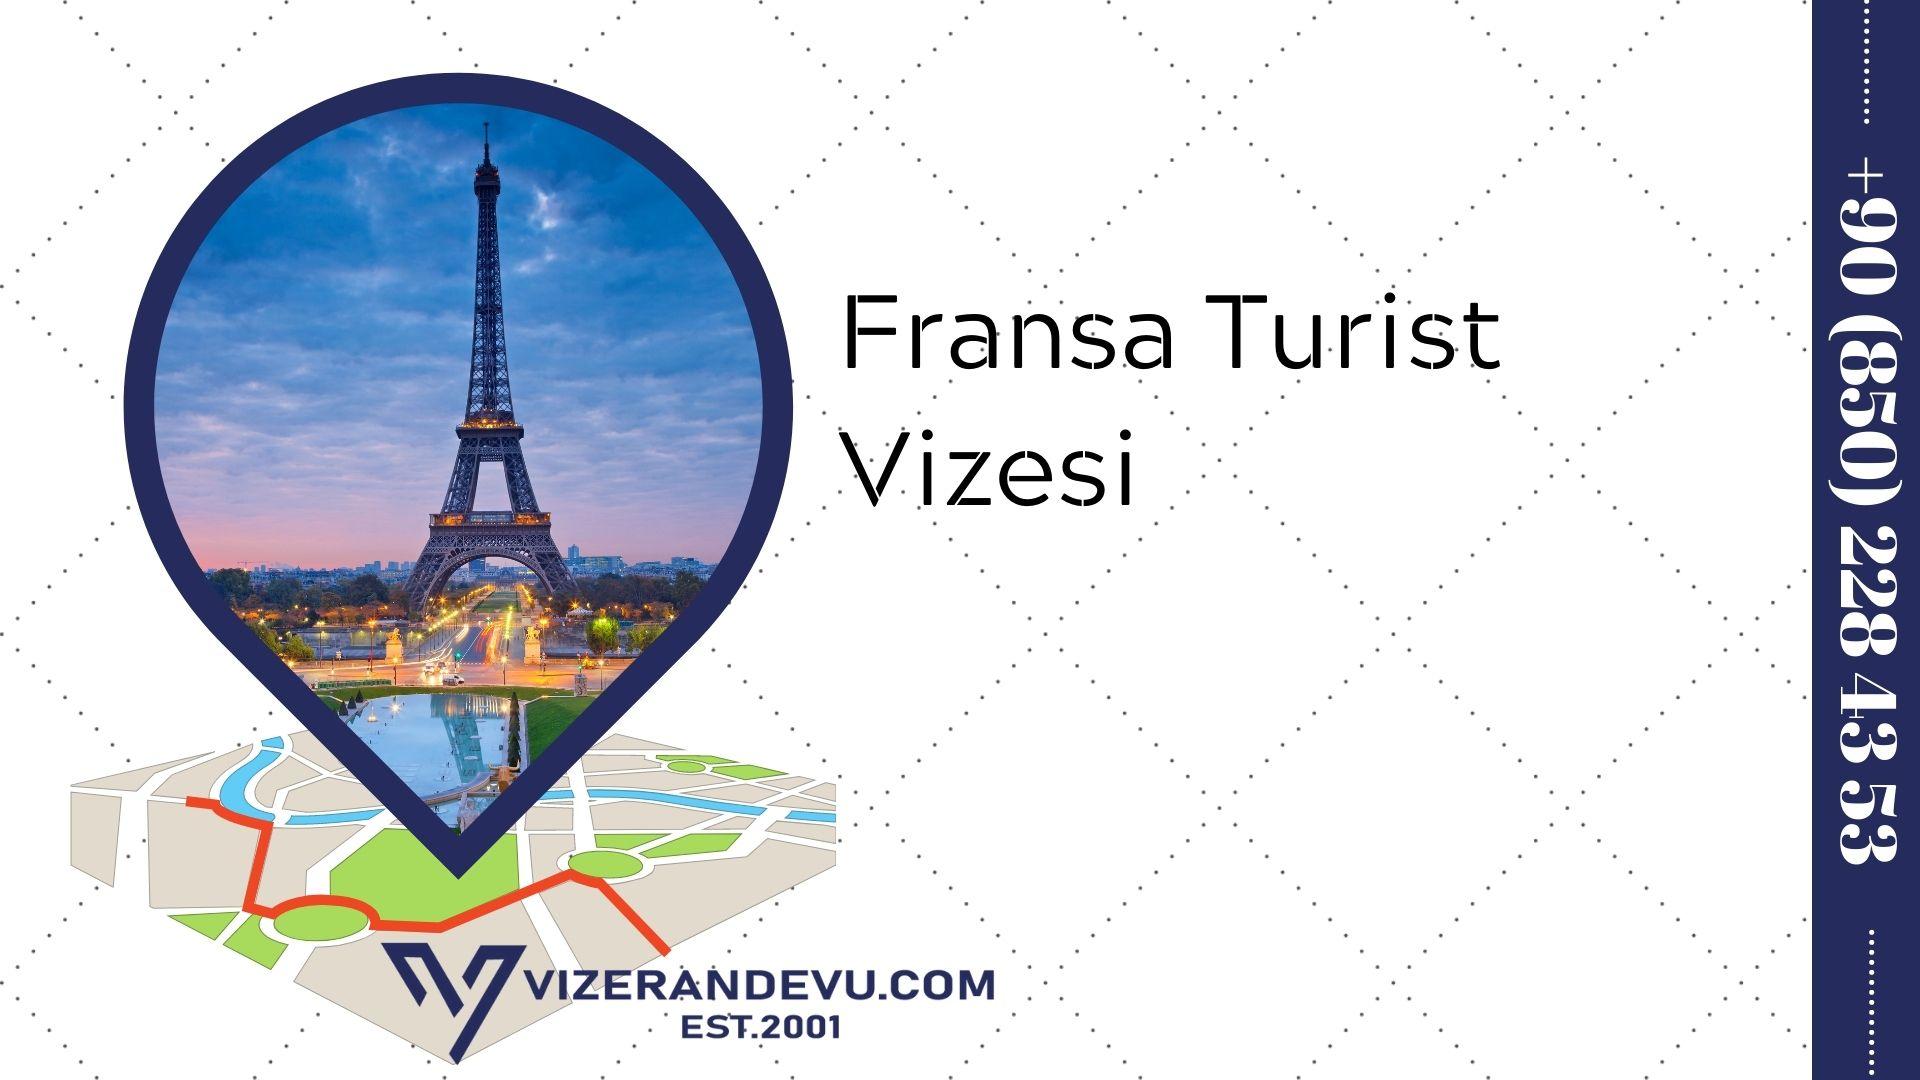 Fransa Turist Vizesi